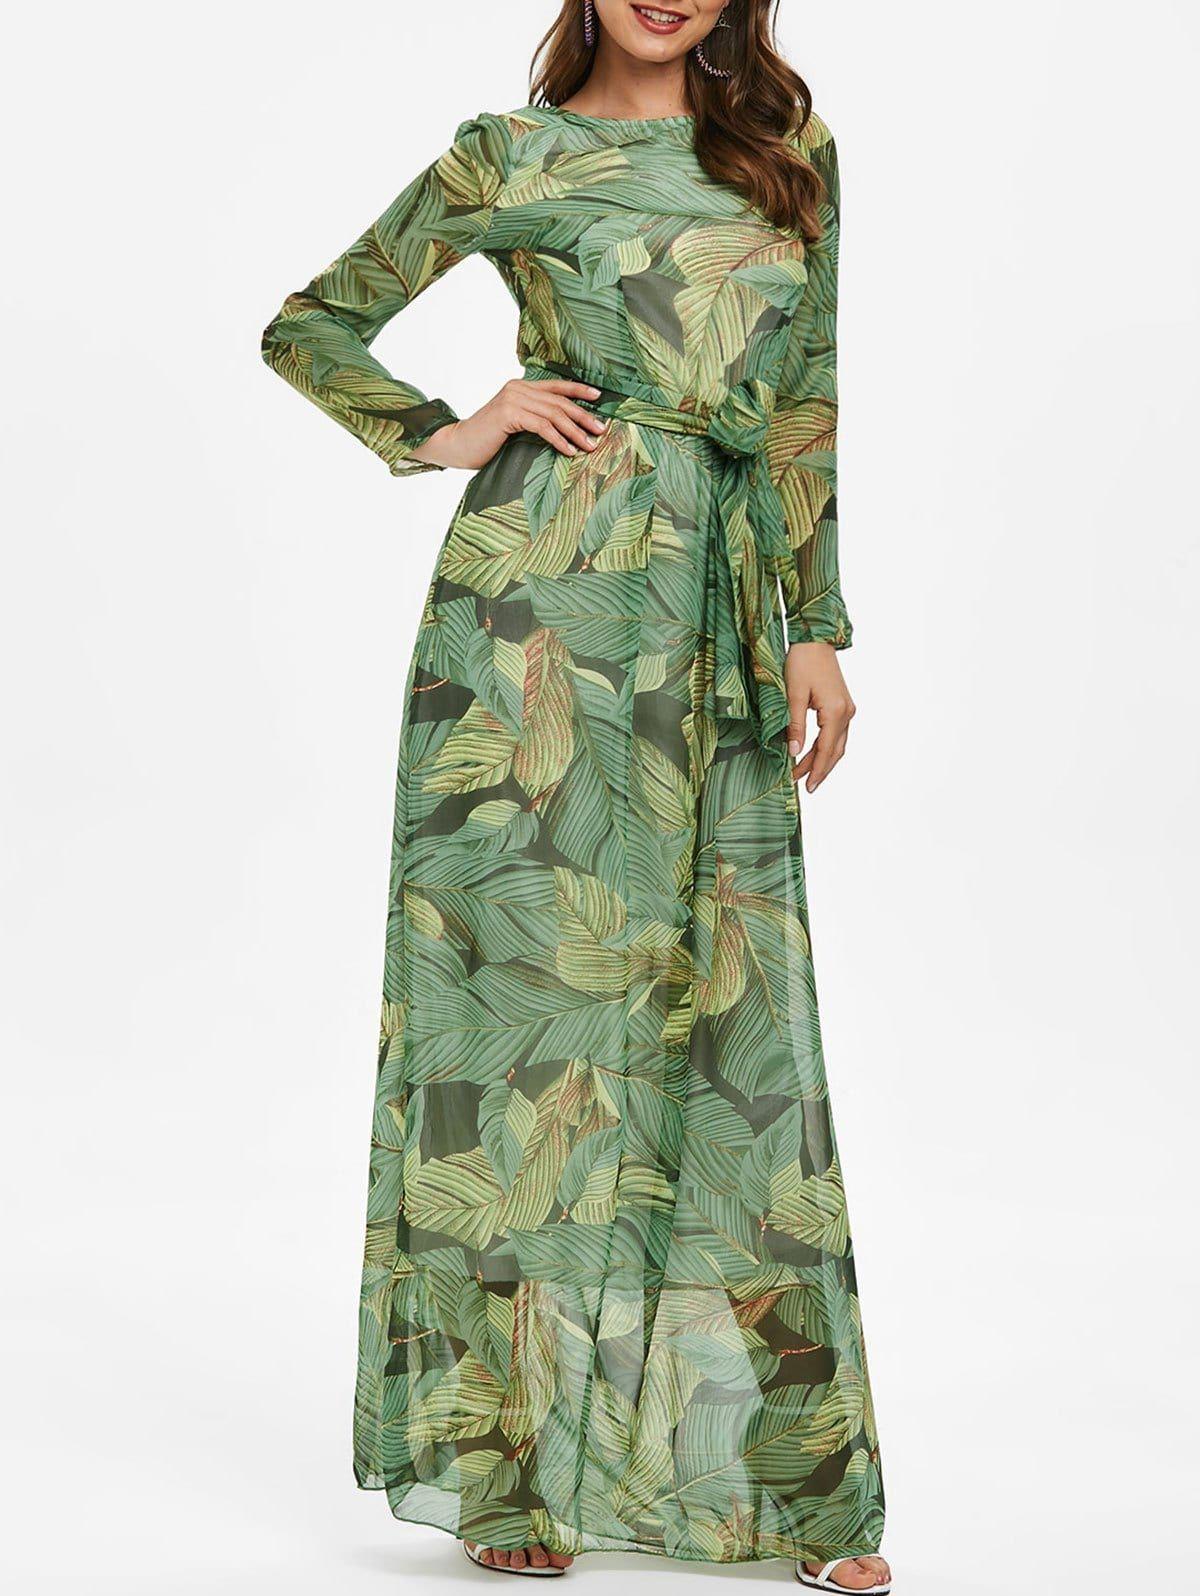 3d73d1b47512 Tropical Print Bohemian Maxi Dress Use code:RGIWD with 25% discount 3.8  Rosegal Women s